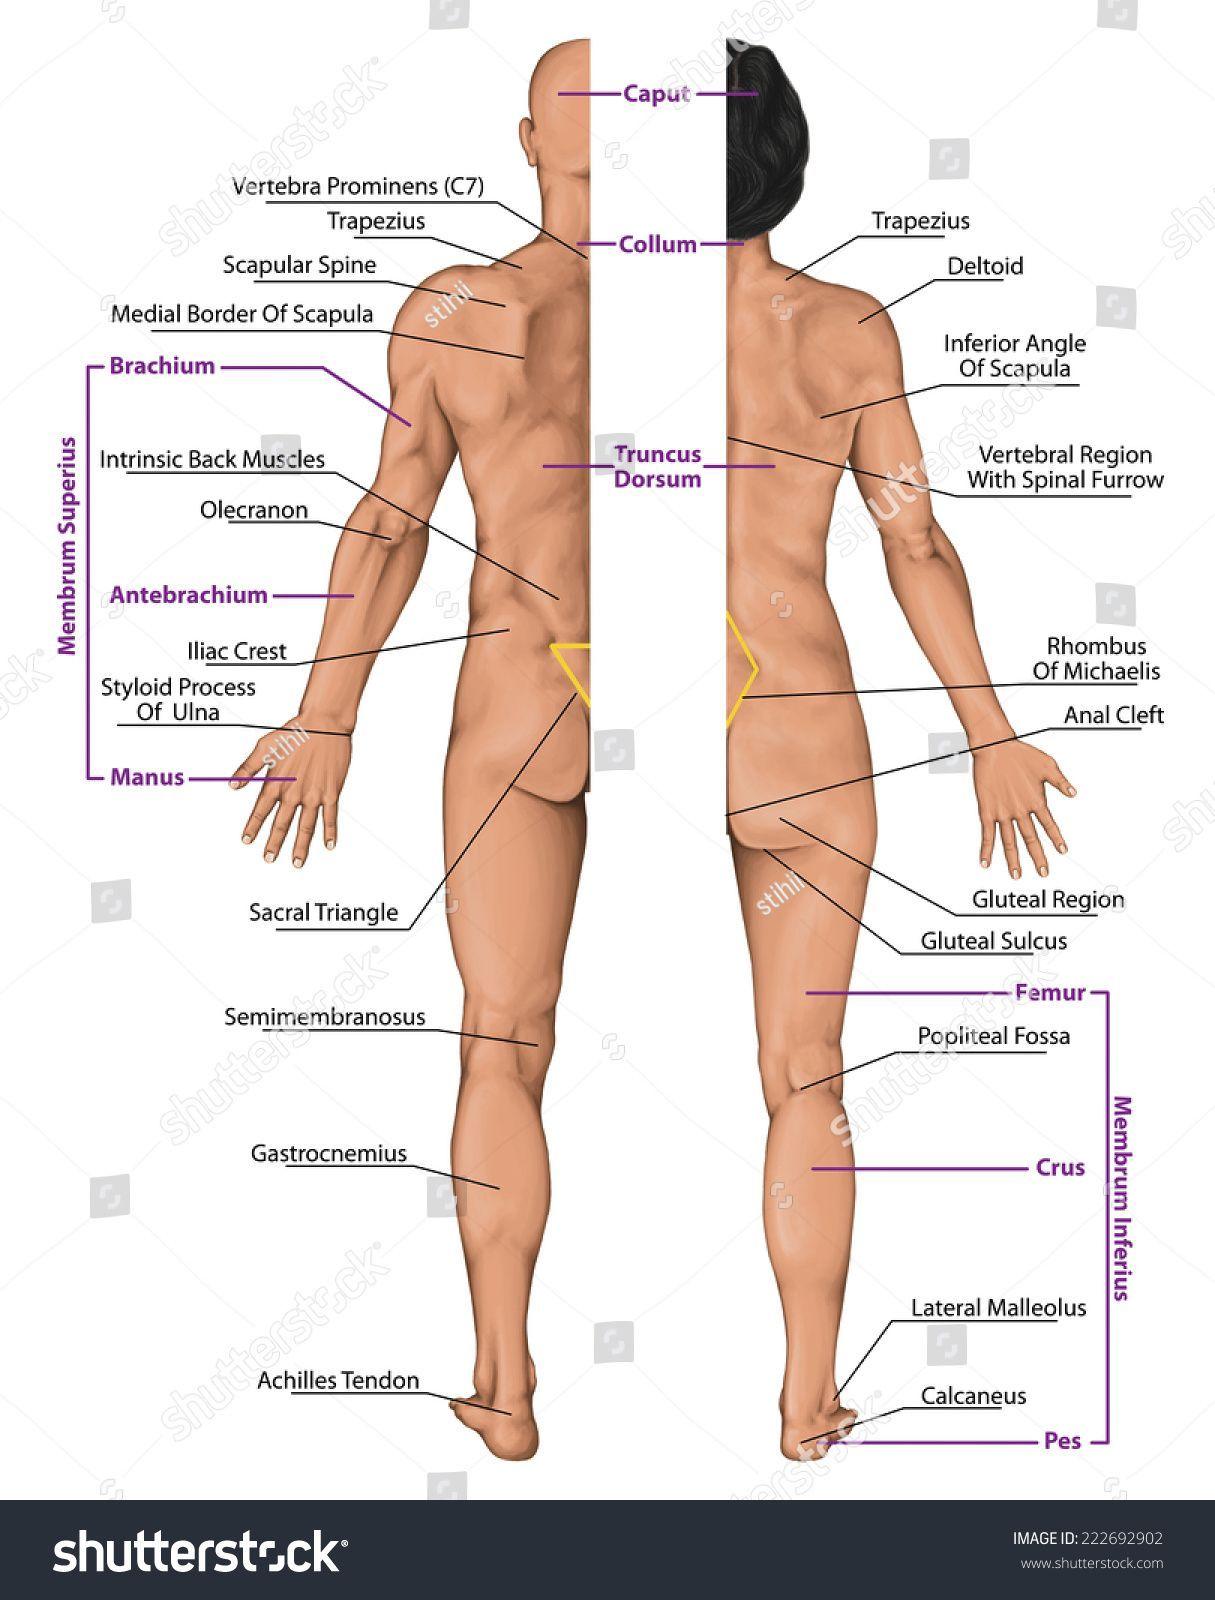 Male Female Anatomy Diagrams Male Female Anatomy Diagrams Male Female Anatomical Body Surface Anatomy Stoc Body Diagram Human Body Anatomy Human Body Diagram